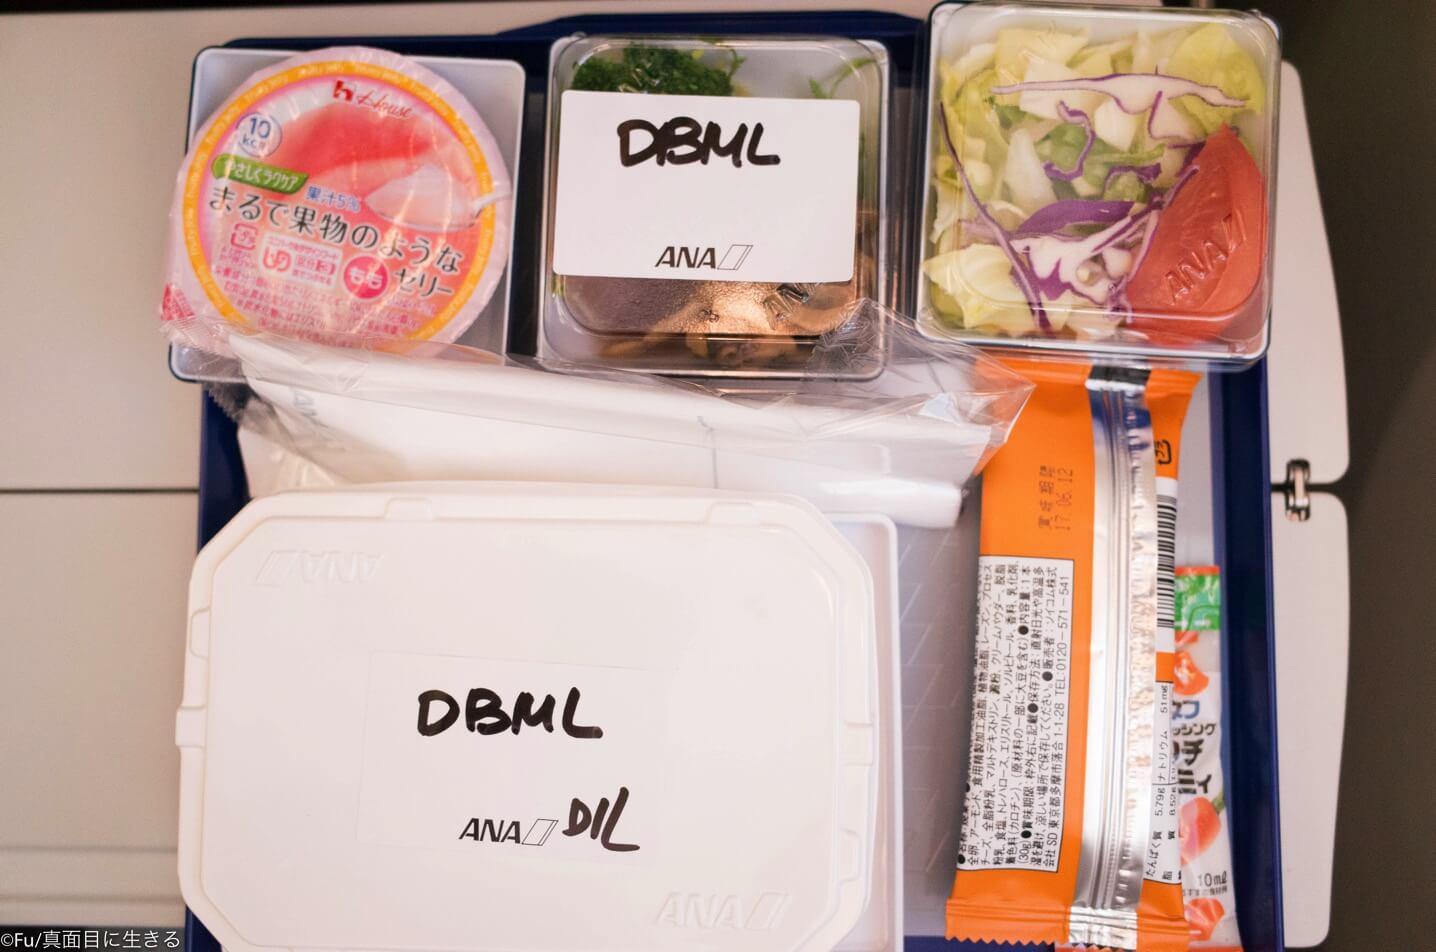 糖尿病対応ミール(DBML)